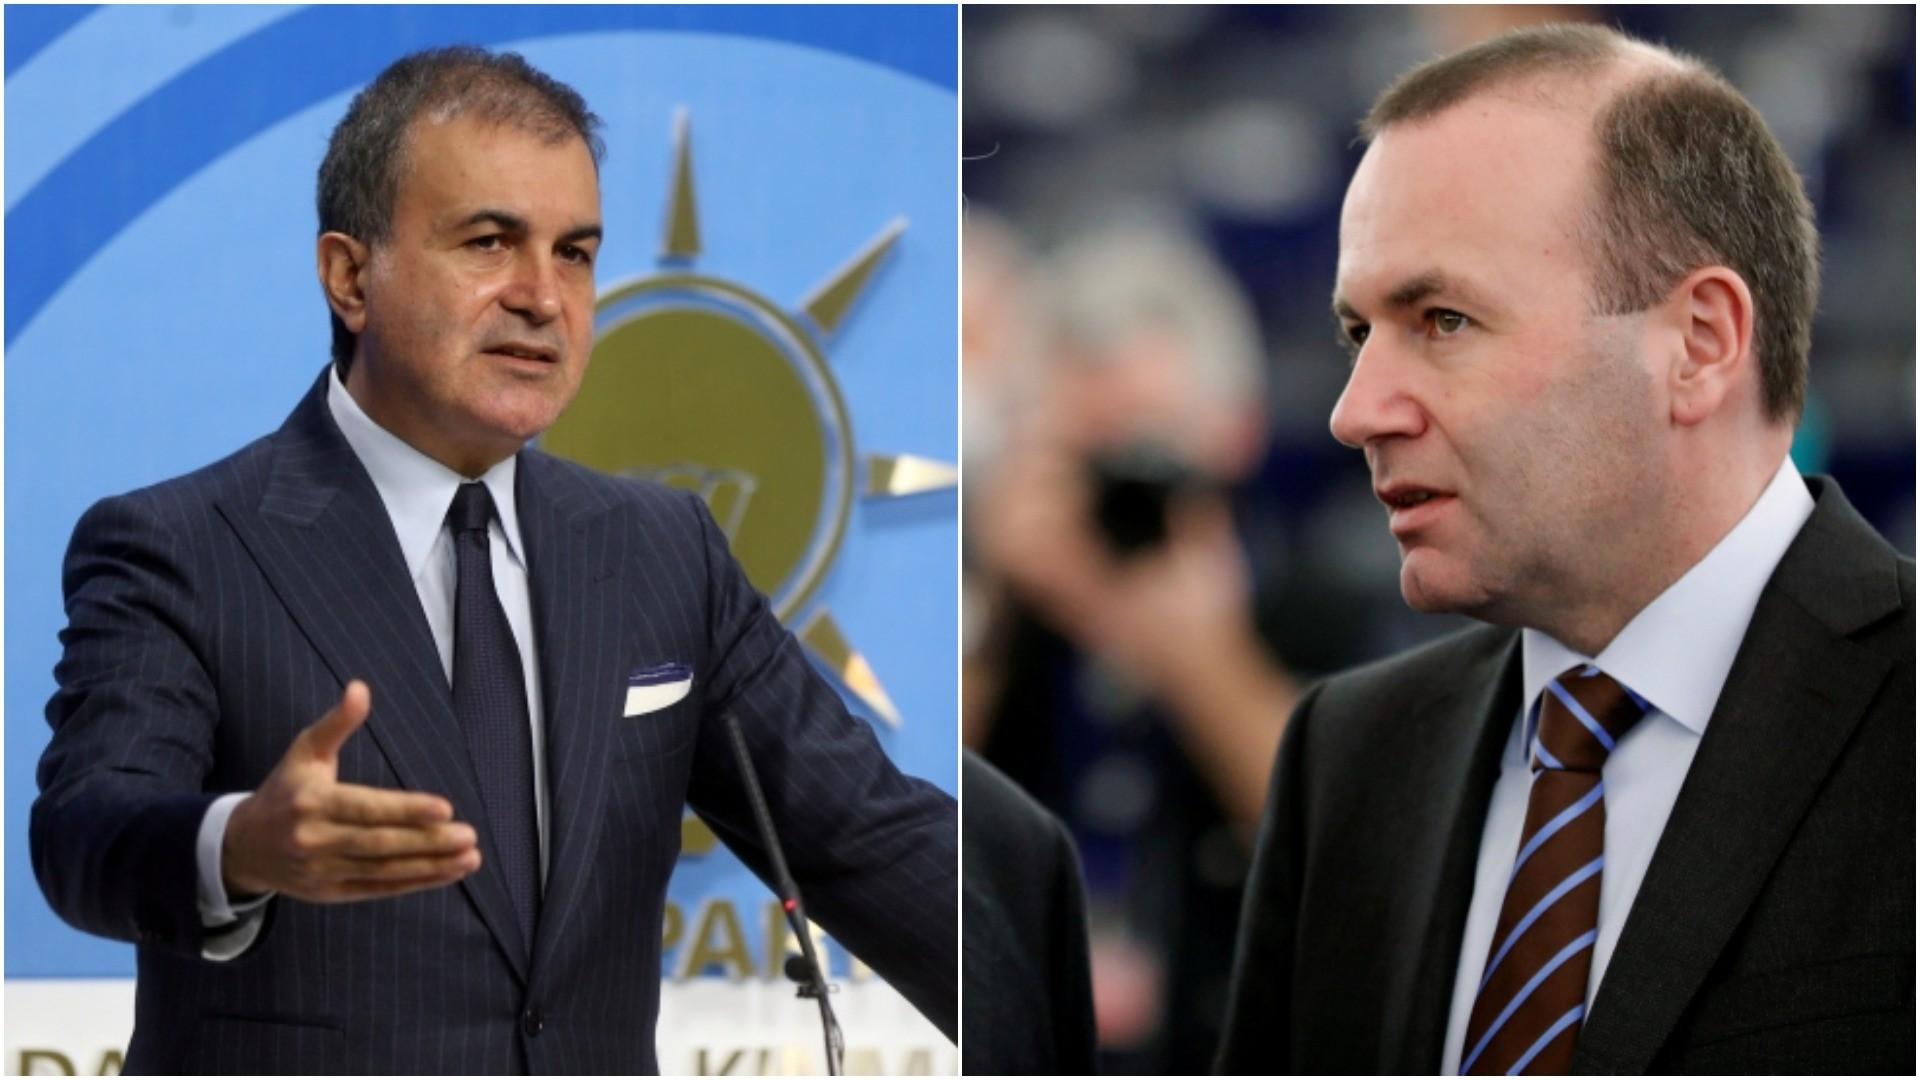 Combination photo shows AK Party Spokesperon u00d6mer u00c7elik (L) and Manfred Weber, Chairman of the EPP group. (AP/REUTERS Photos)